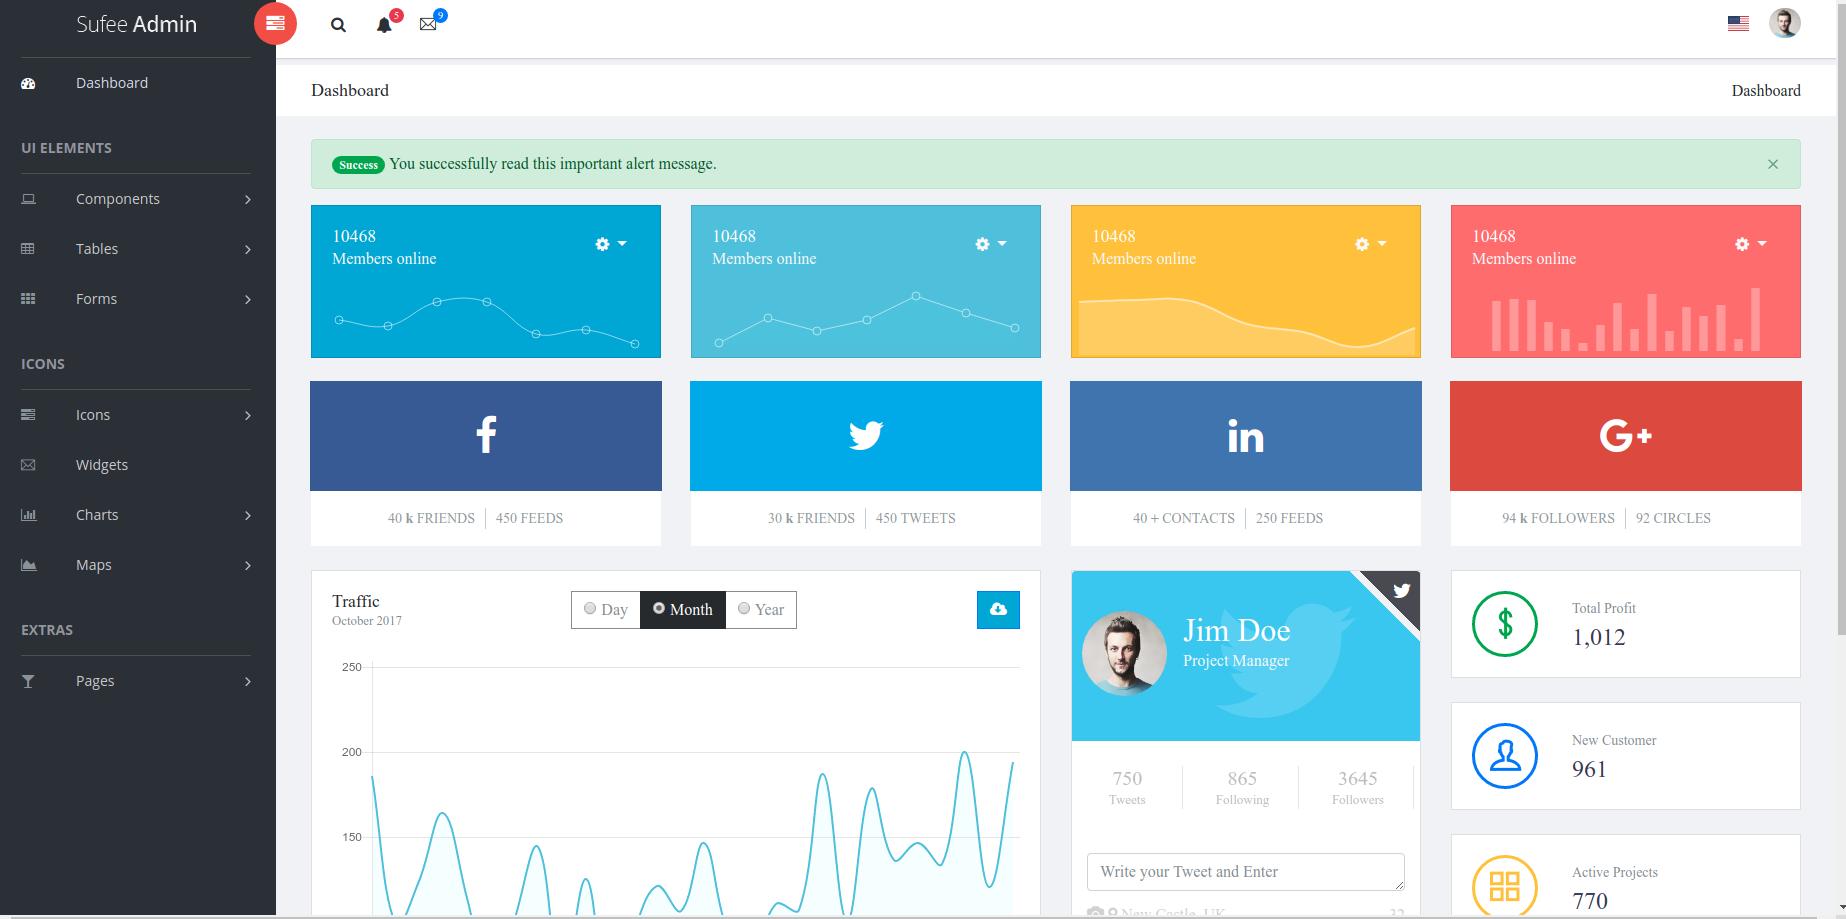 sufee-admin-dashboard